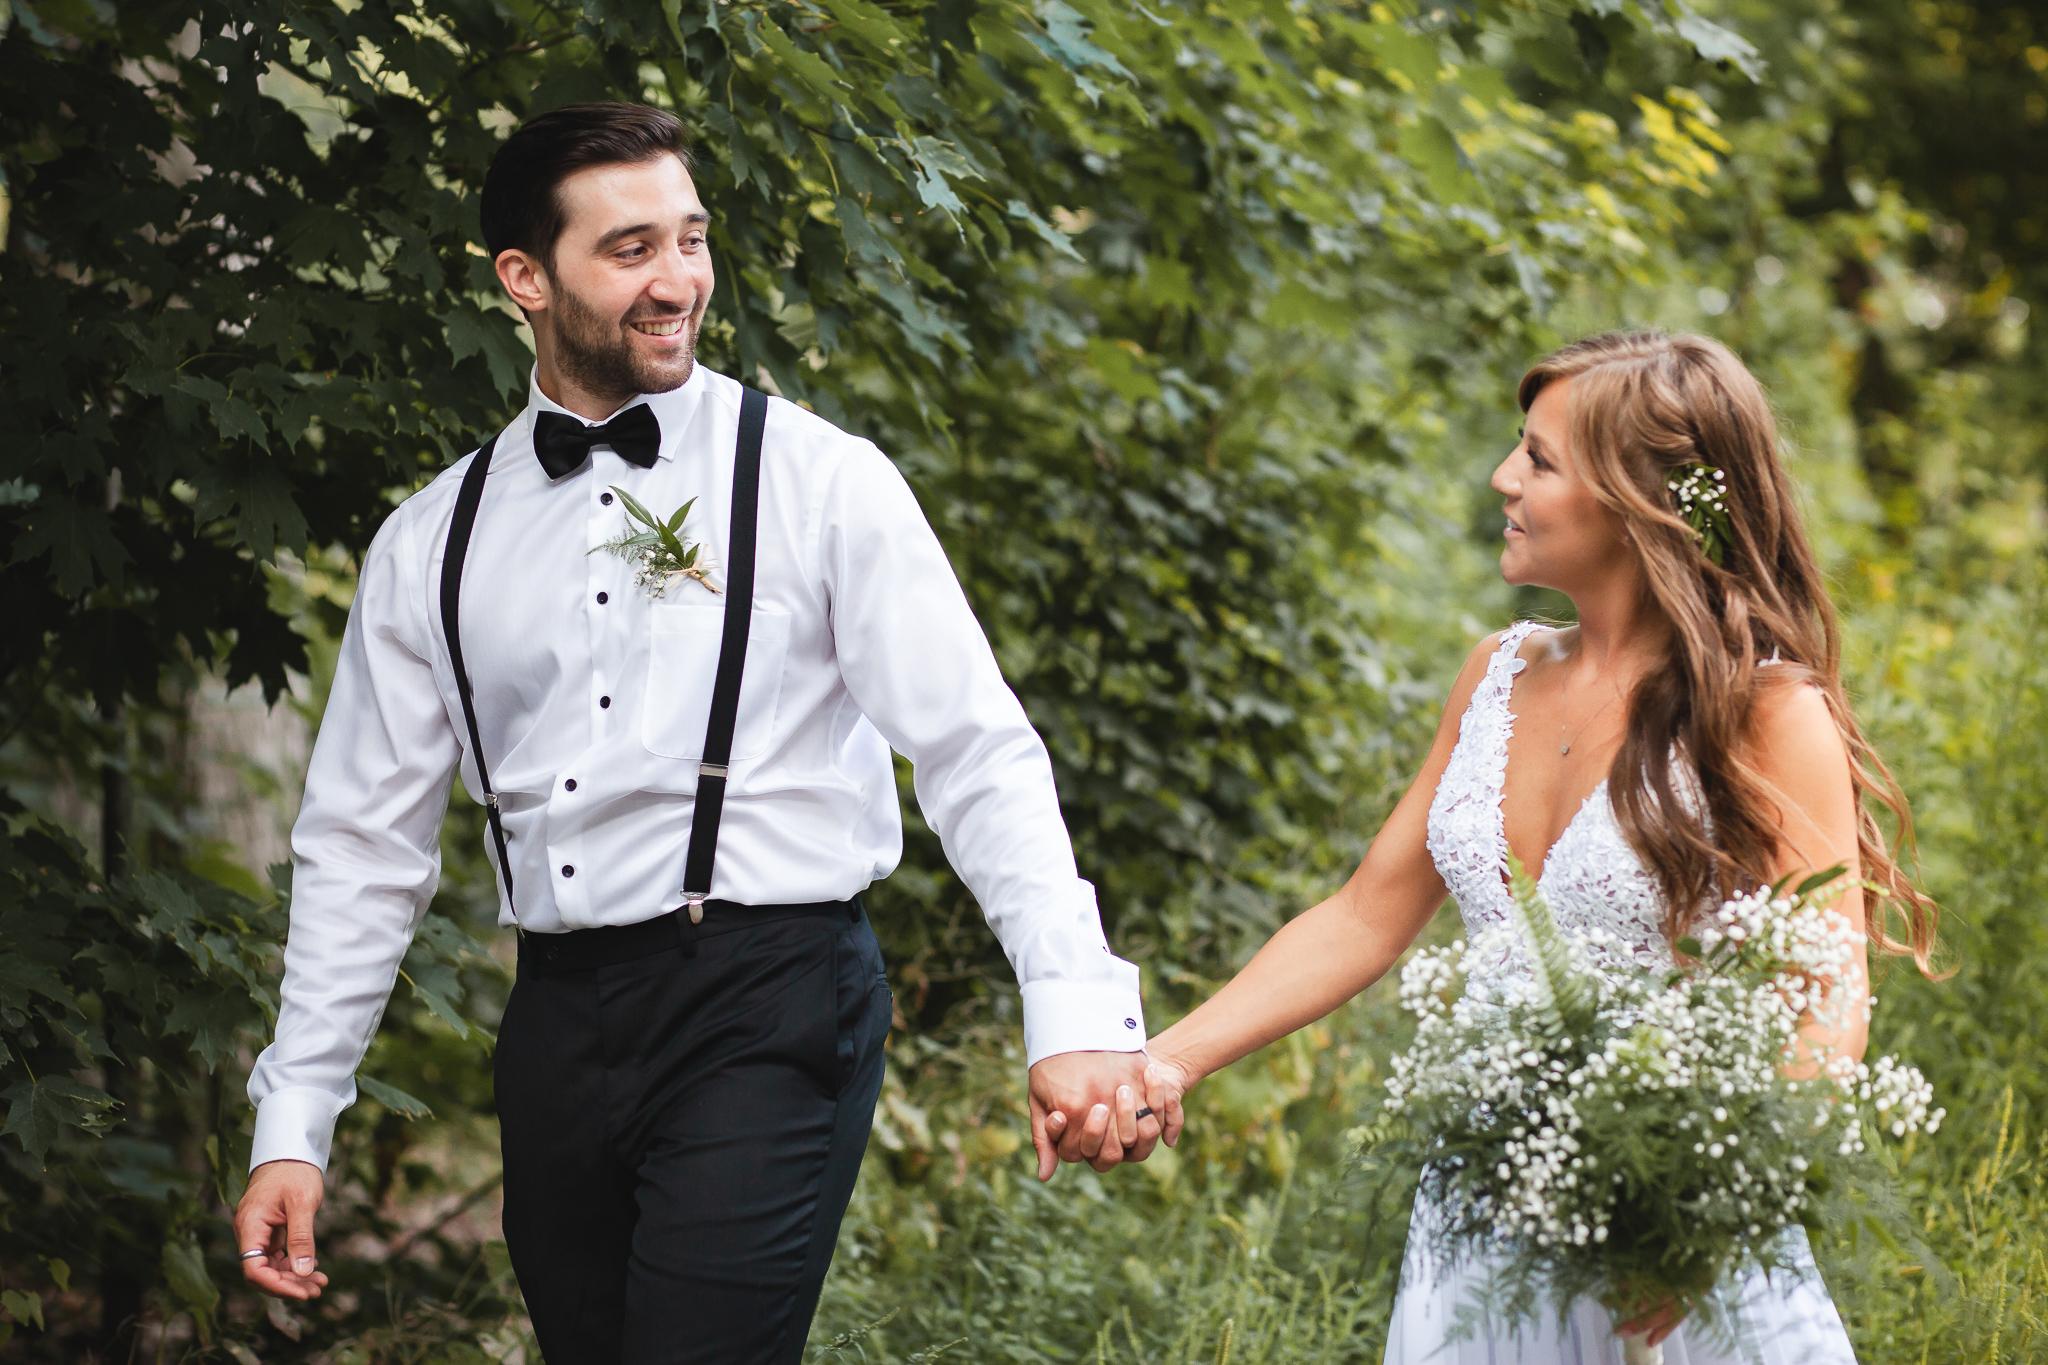 Amy D Photography- Bride and Groom- Wedding Poses- Muskoka Wedding- Barrie Wedding Photographer- Best Wedding Photographer- Muskoka Wedding Photography- Bride Pose- Groom Pose.jpg